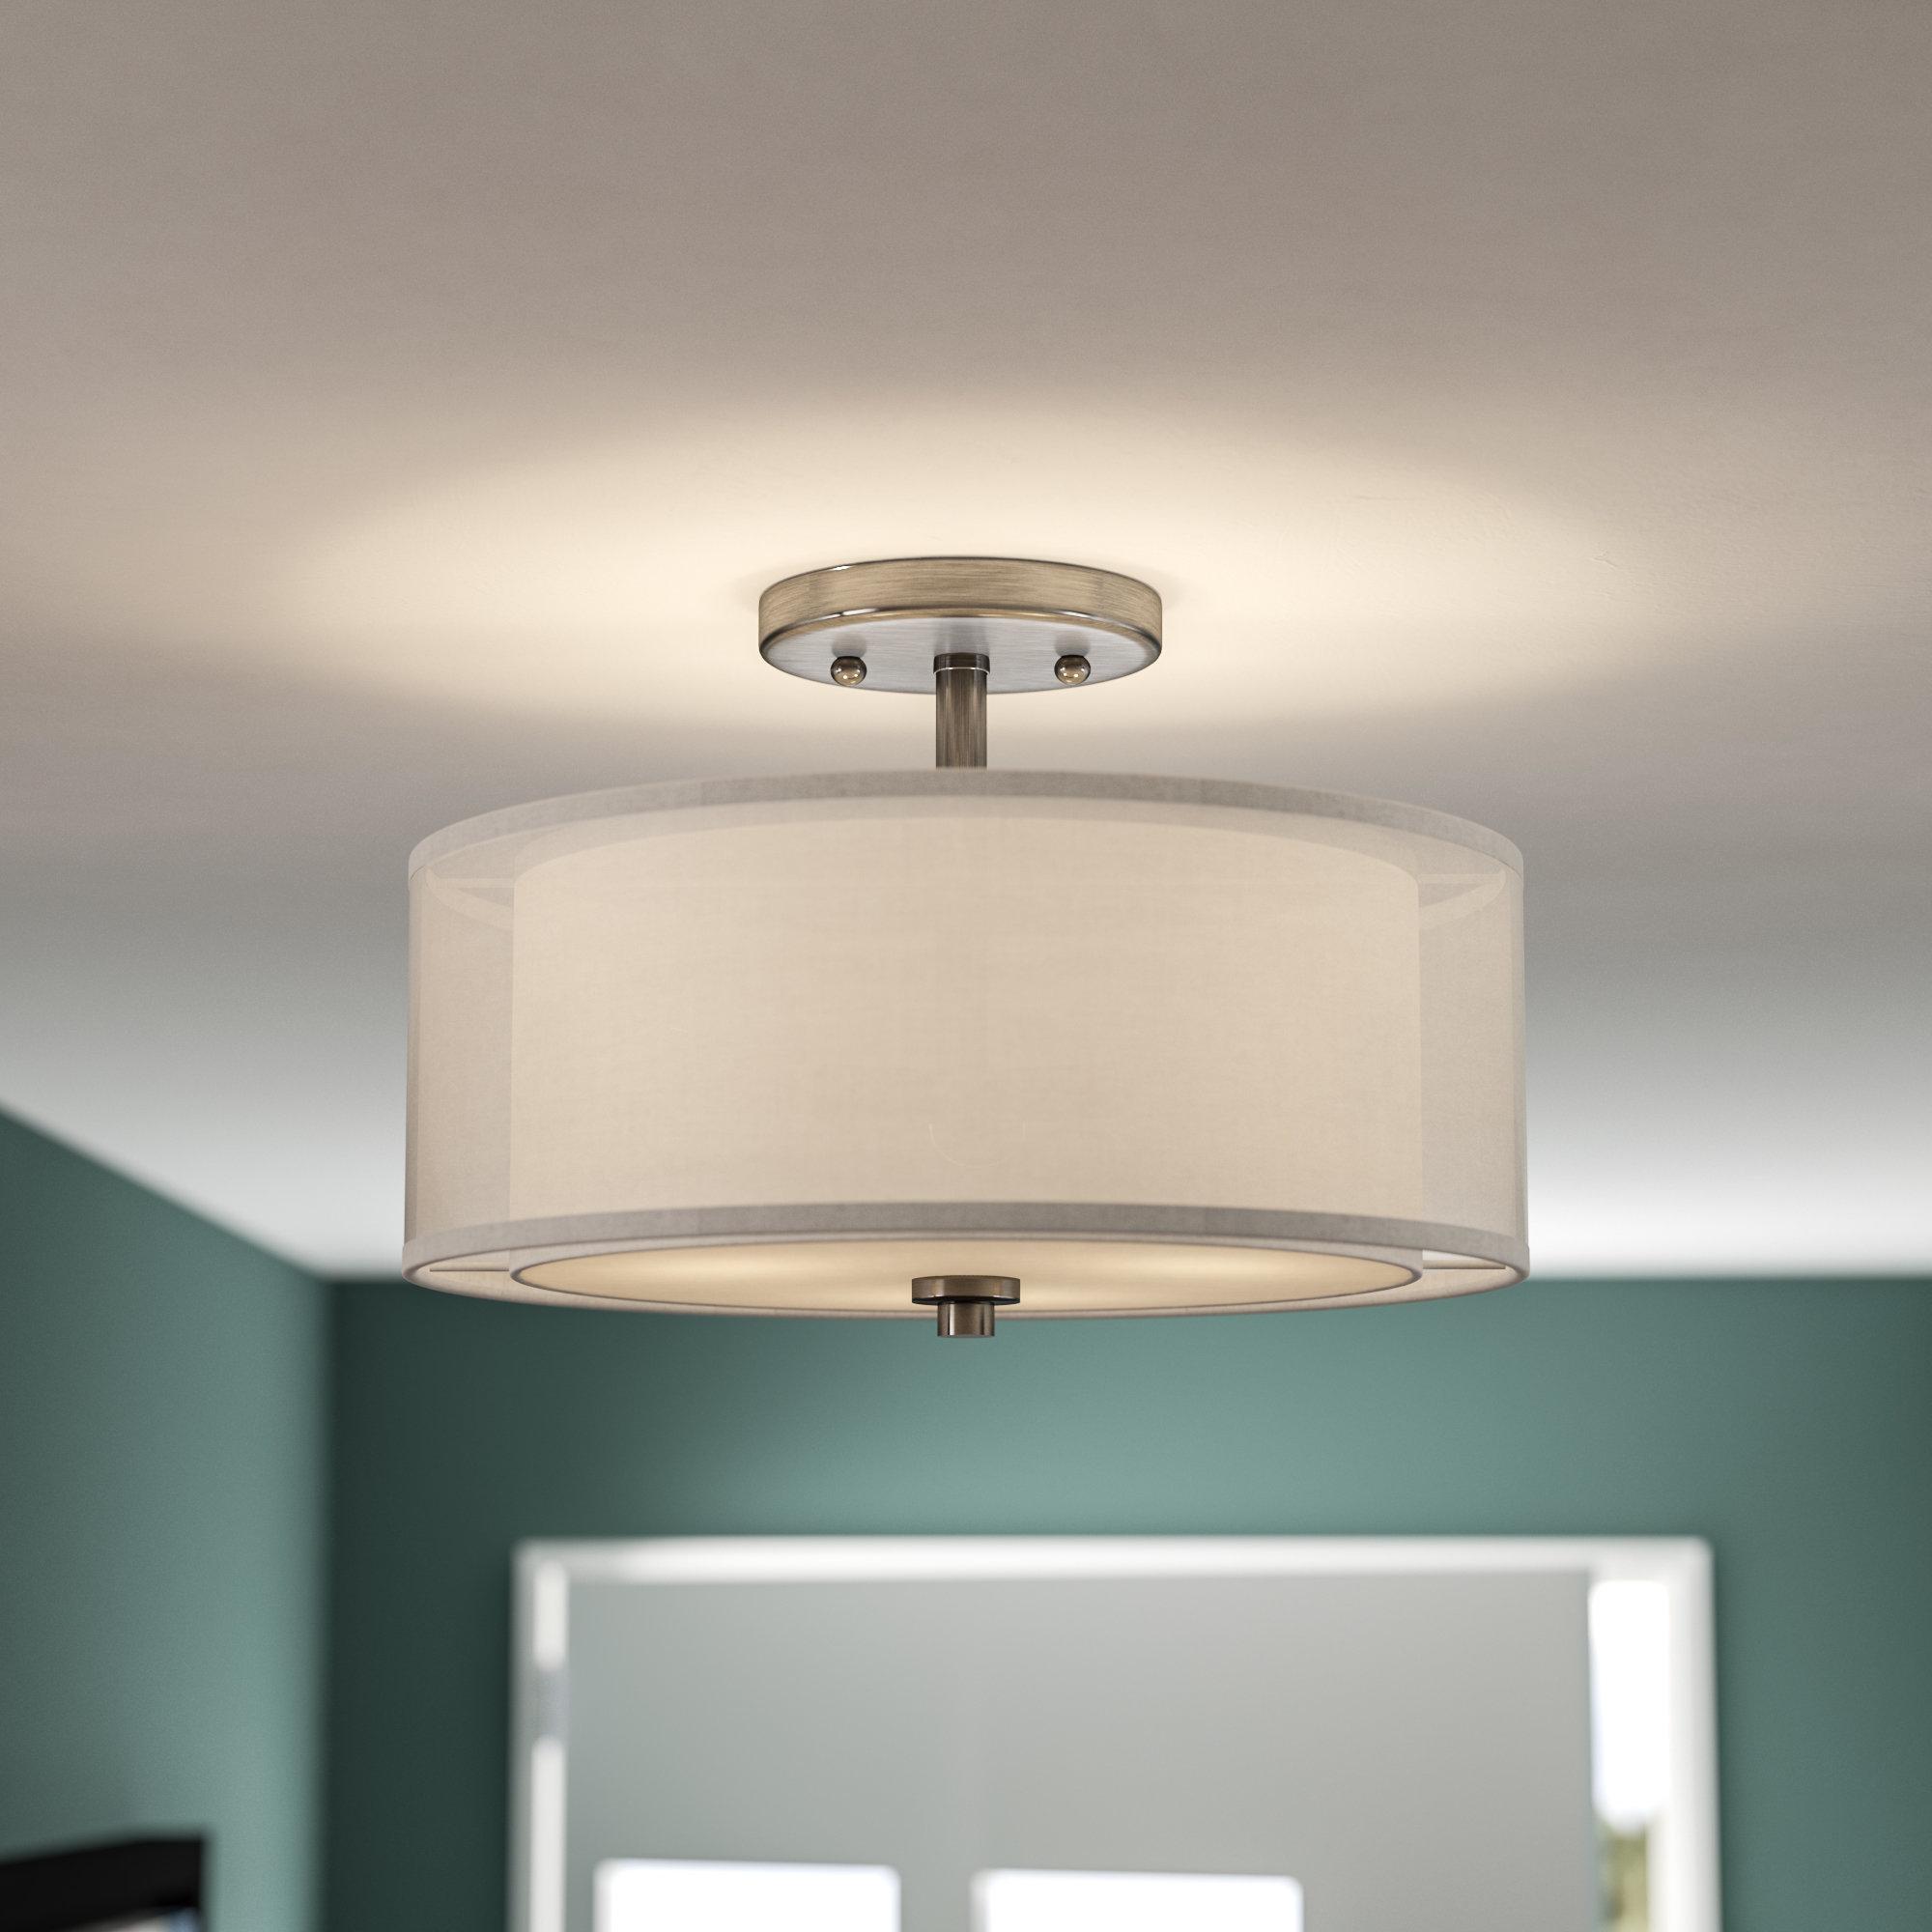 Radtke 3-Light Single Drum Pendants for 2020 Demby 3-Light Semi Flush Mount